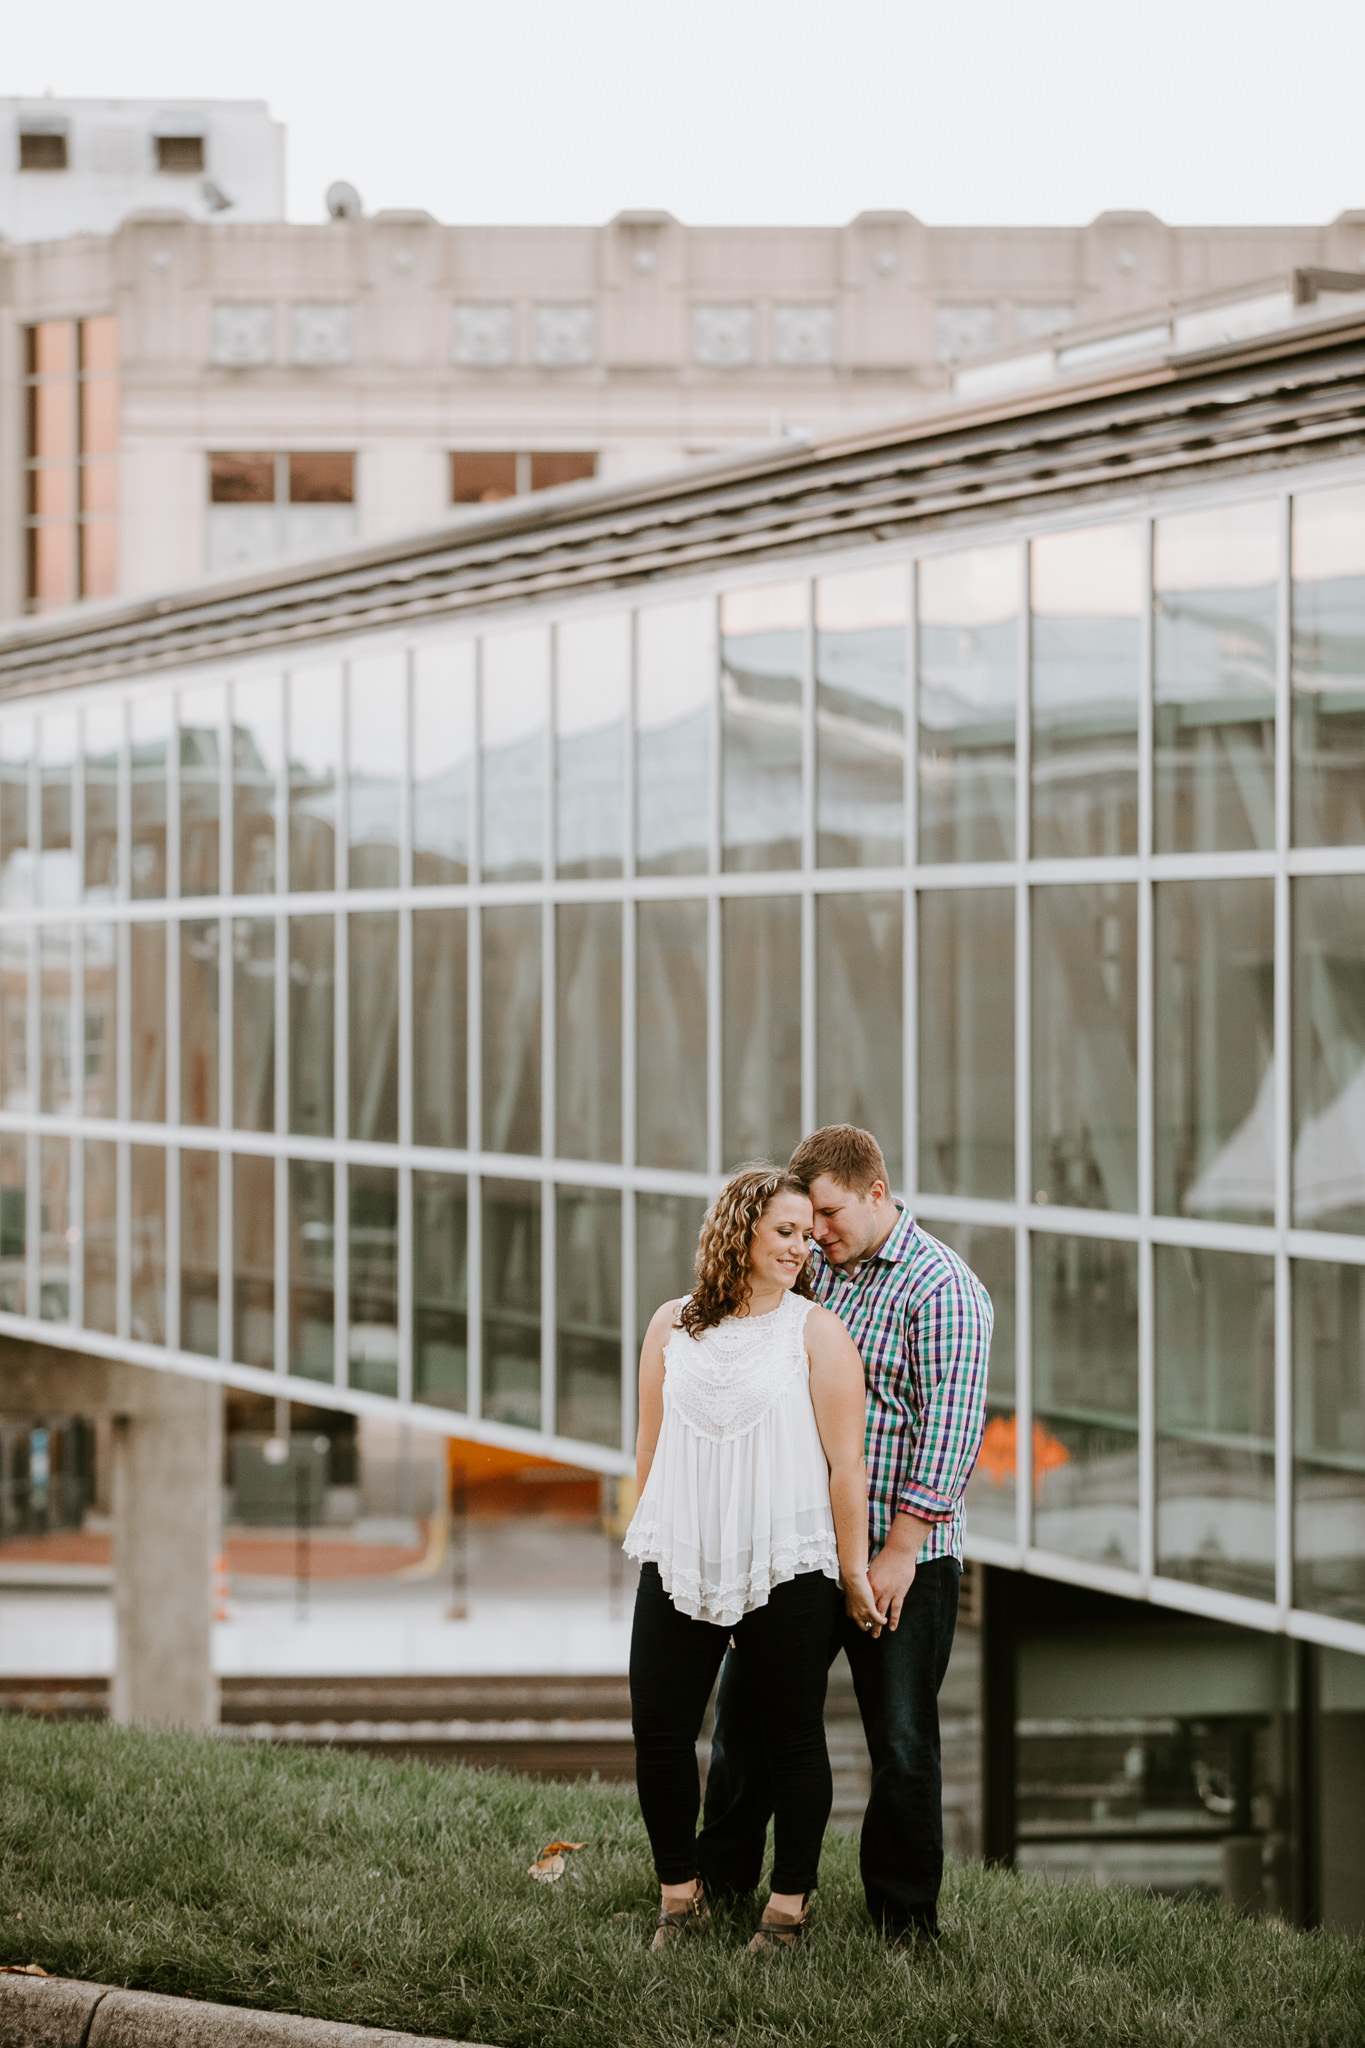 Roanoke - Engagement- Virginia wedding photographer - Pat Cori Photography-28.jpg